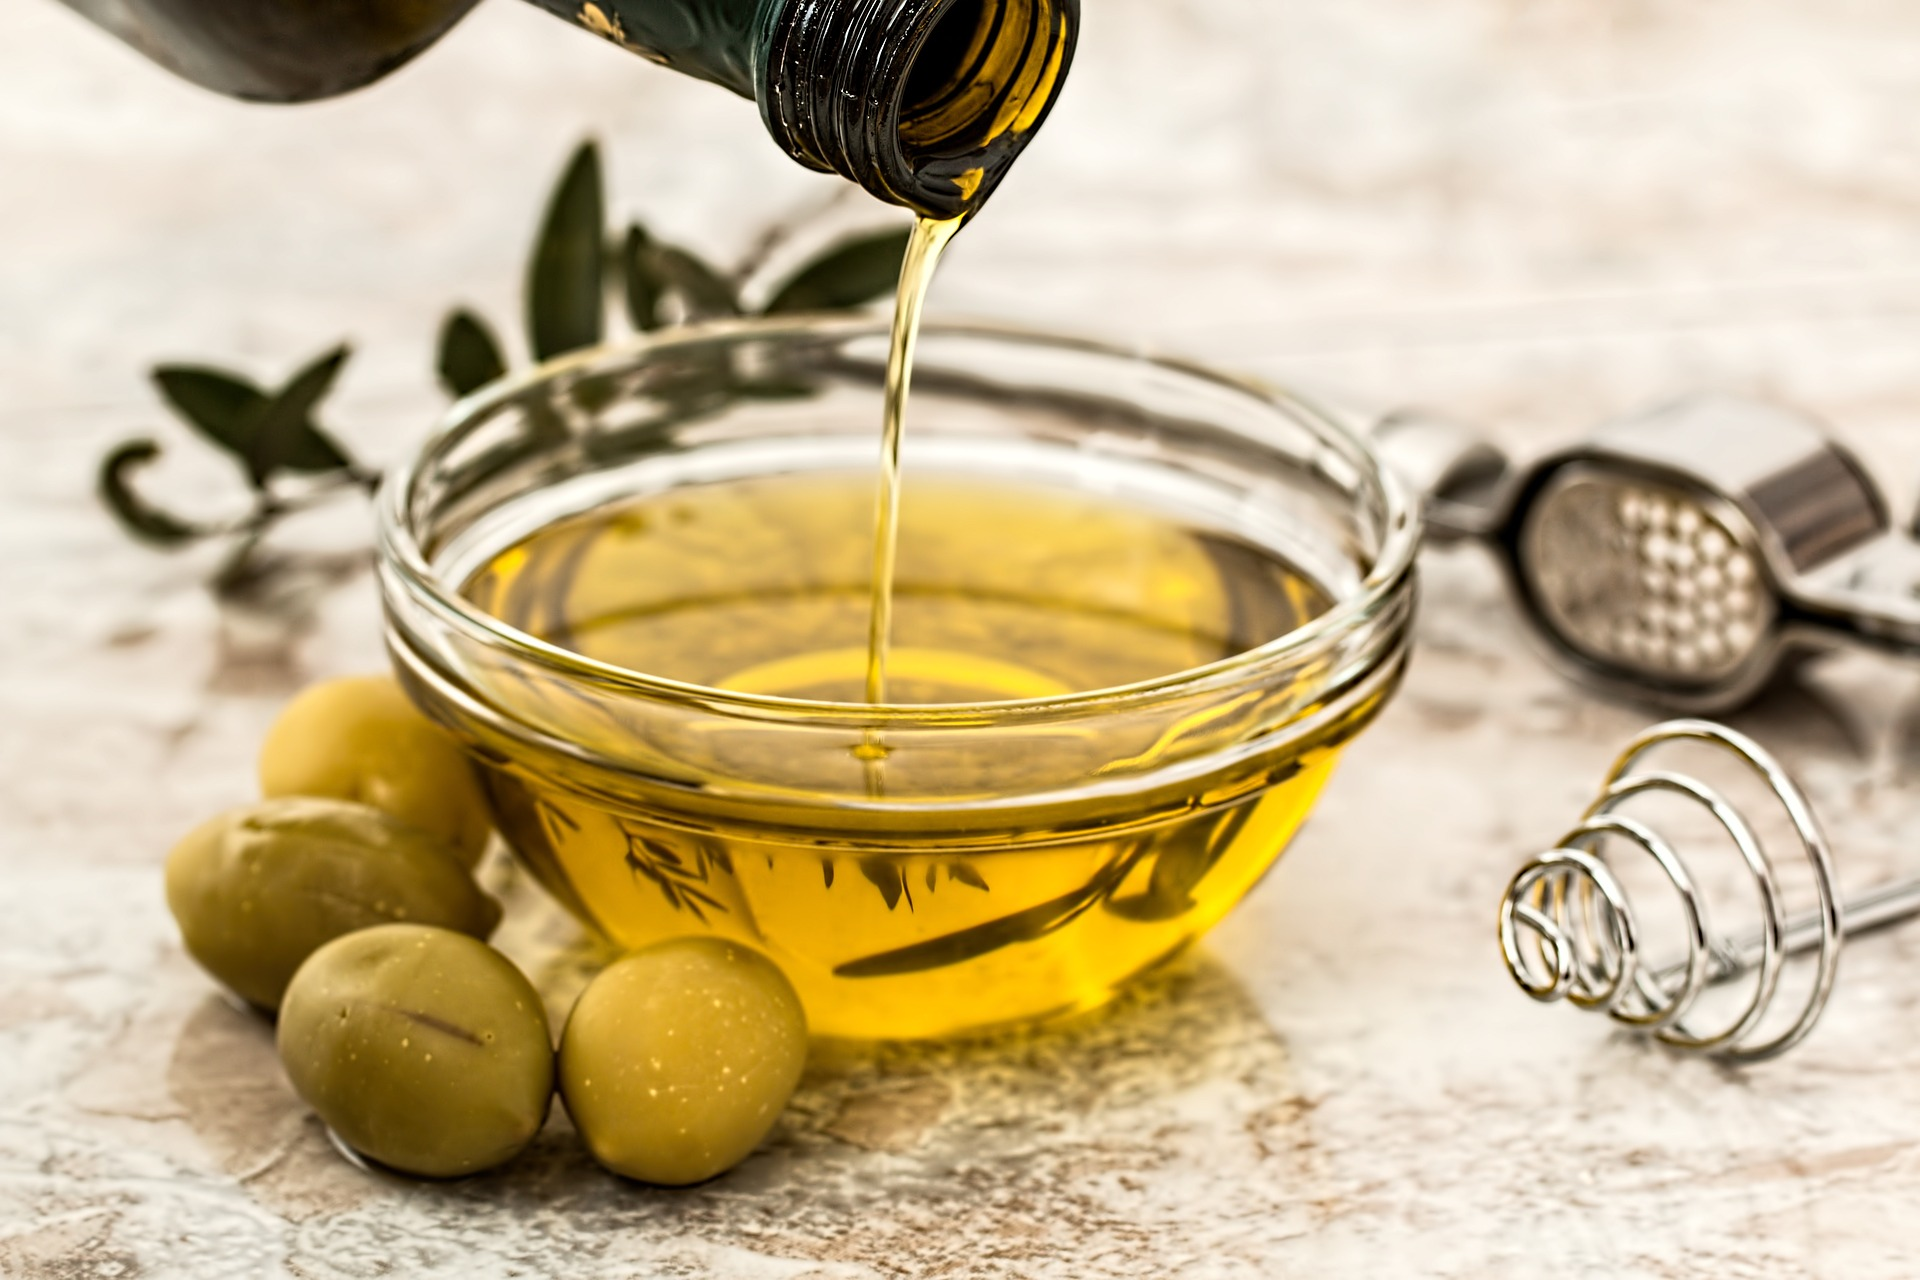 olive-oil-968657_1920-1.jpg